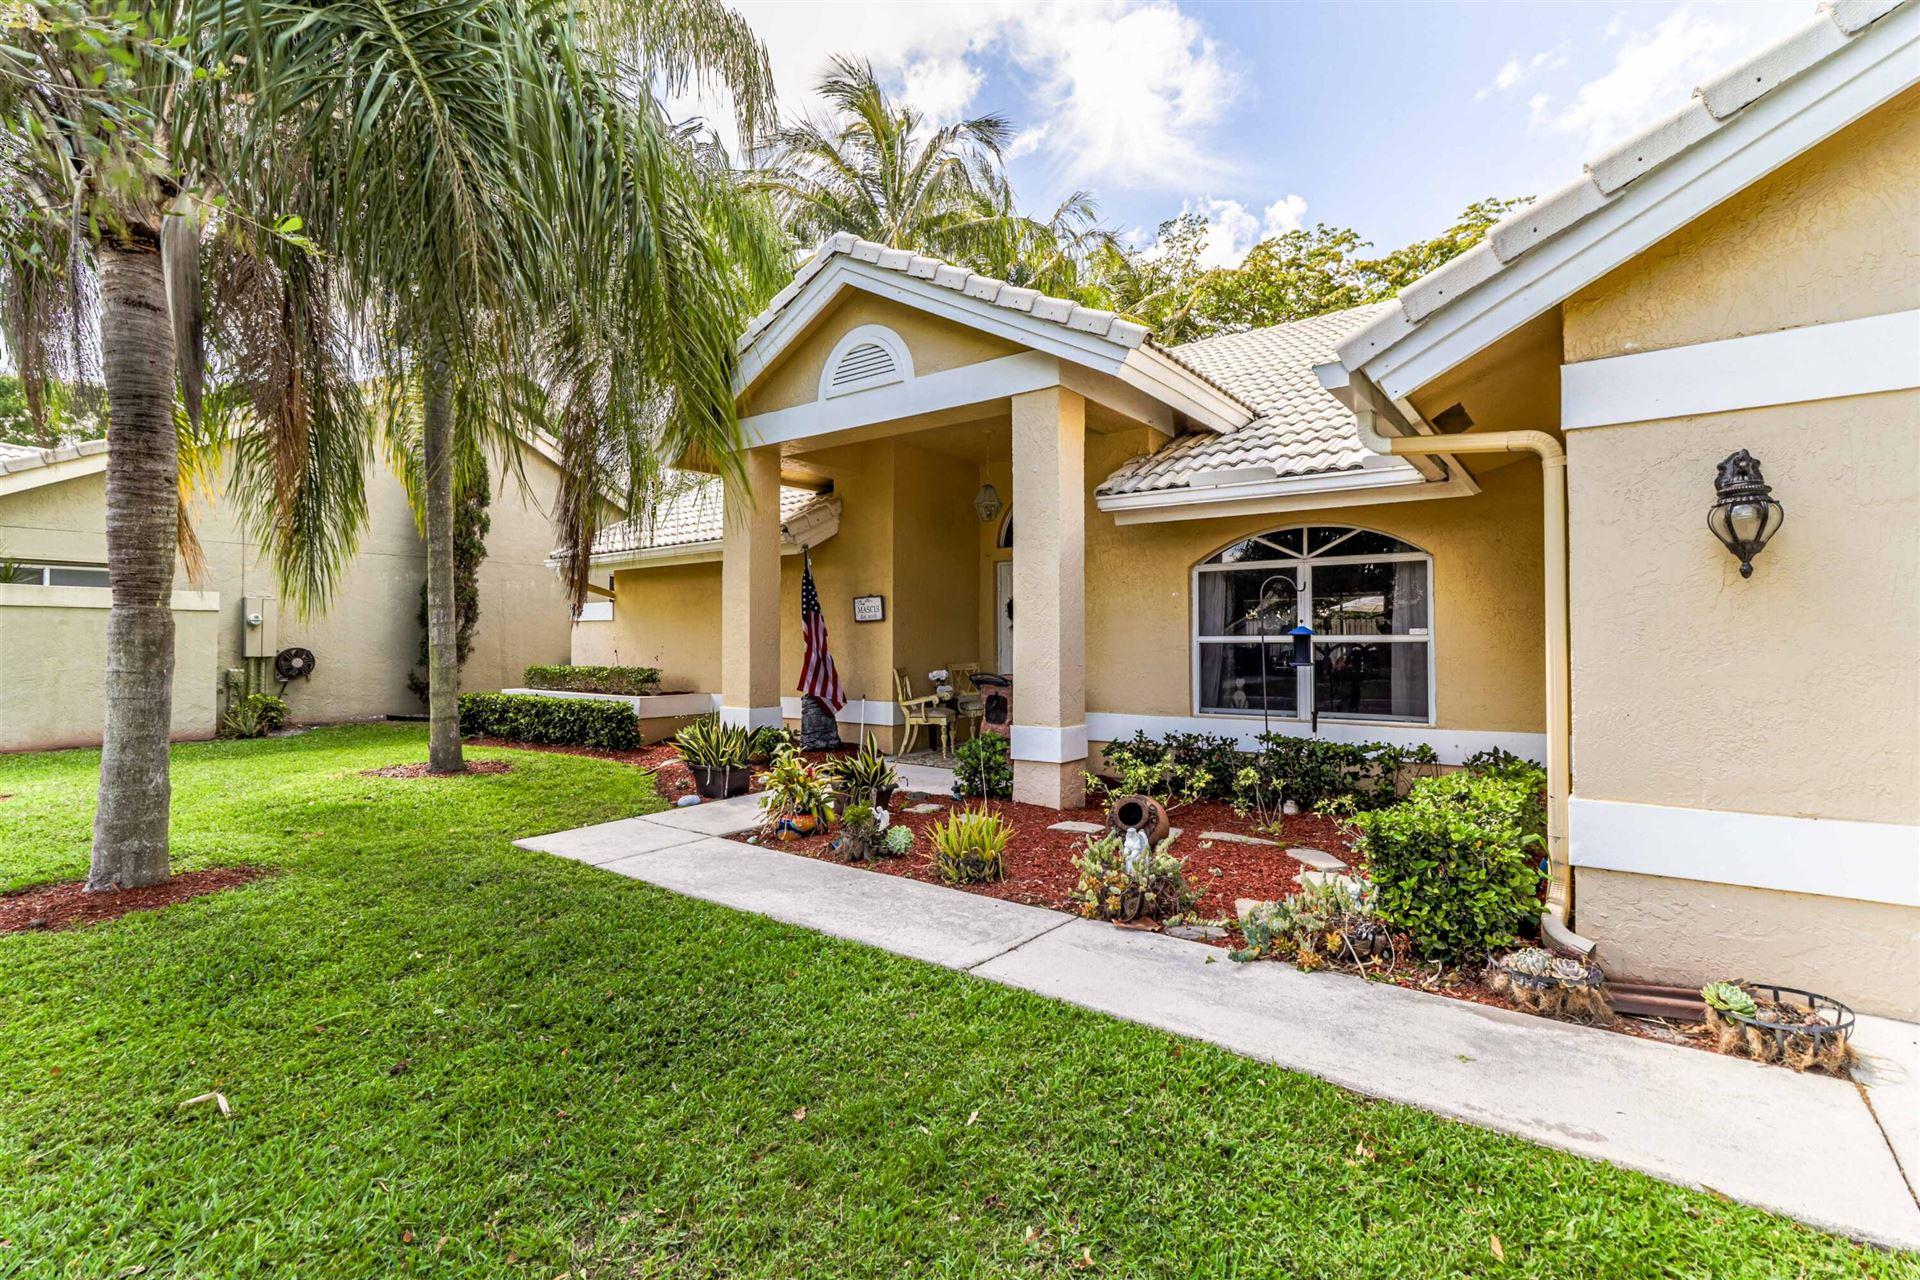 6079 Wedgewood Village Circle, Lake Worth, FL 33463 - MLS#: RX-10720013